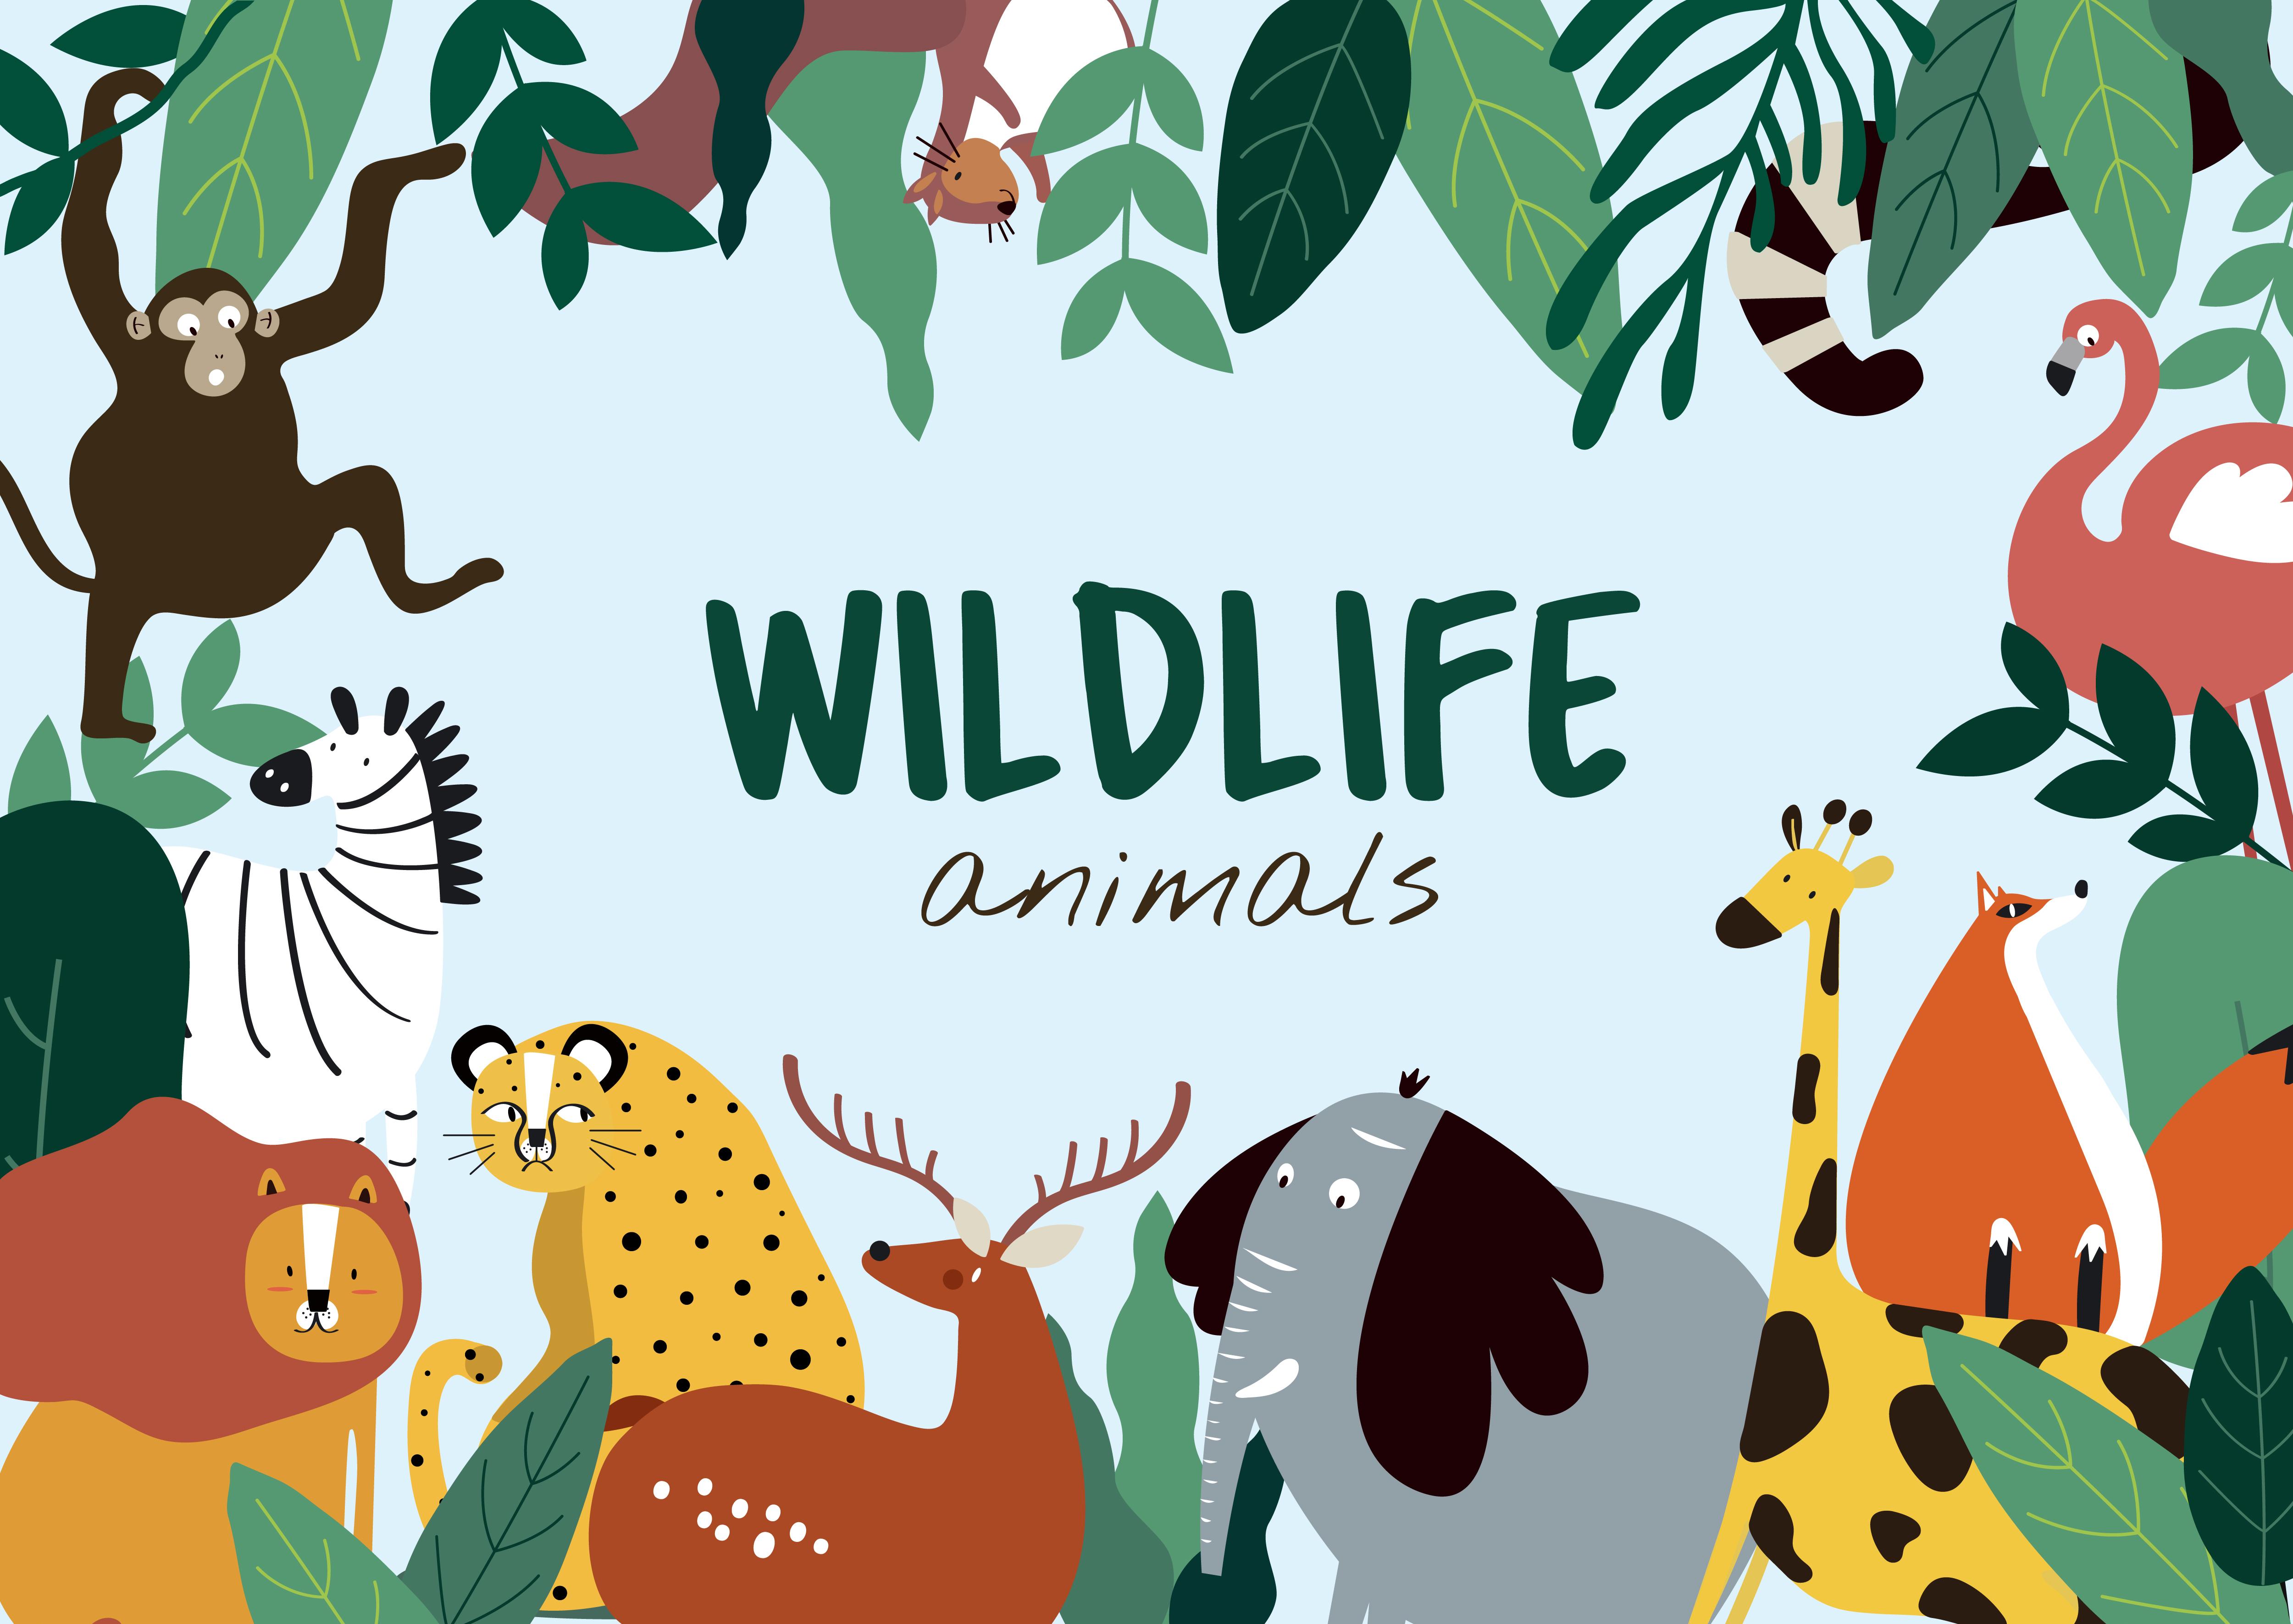 Wildlife animals cartoon style animals template vector